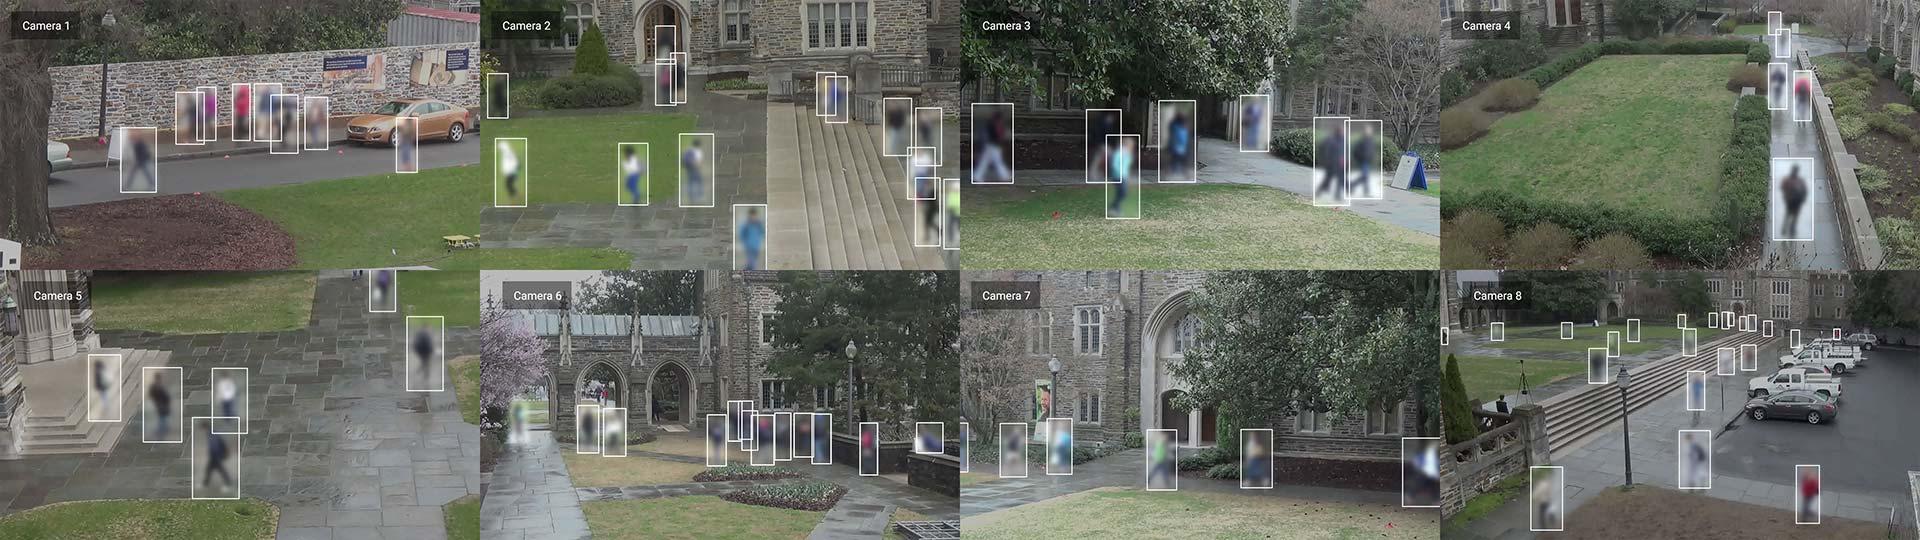 Duke MTMC camera views for 8 cameras deployed on campus © Adam Harvey / MegaPixels.cc